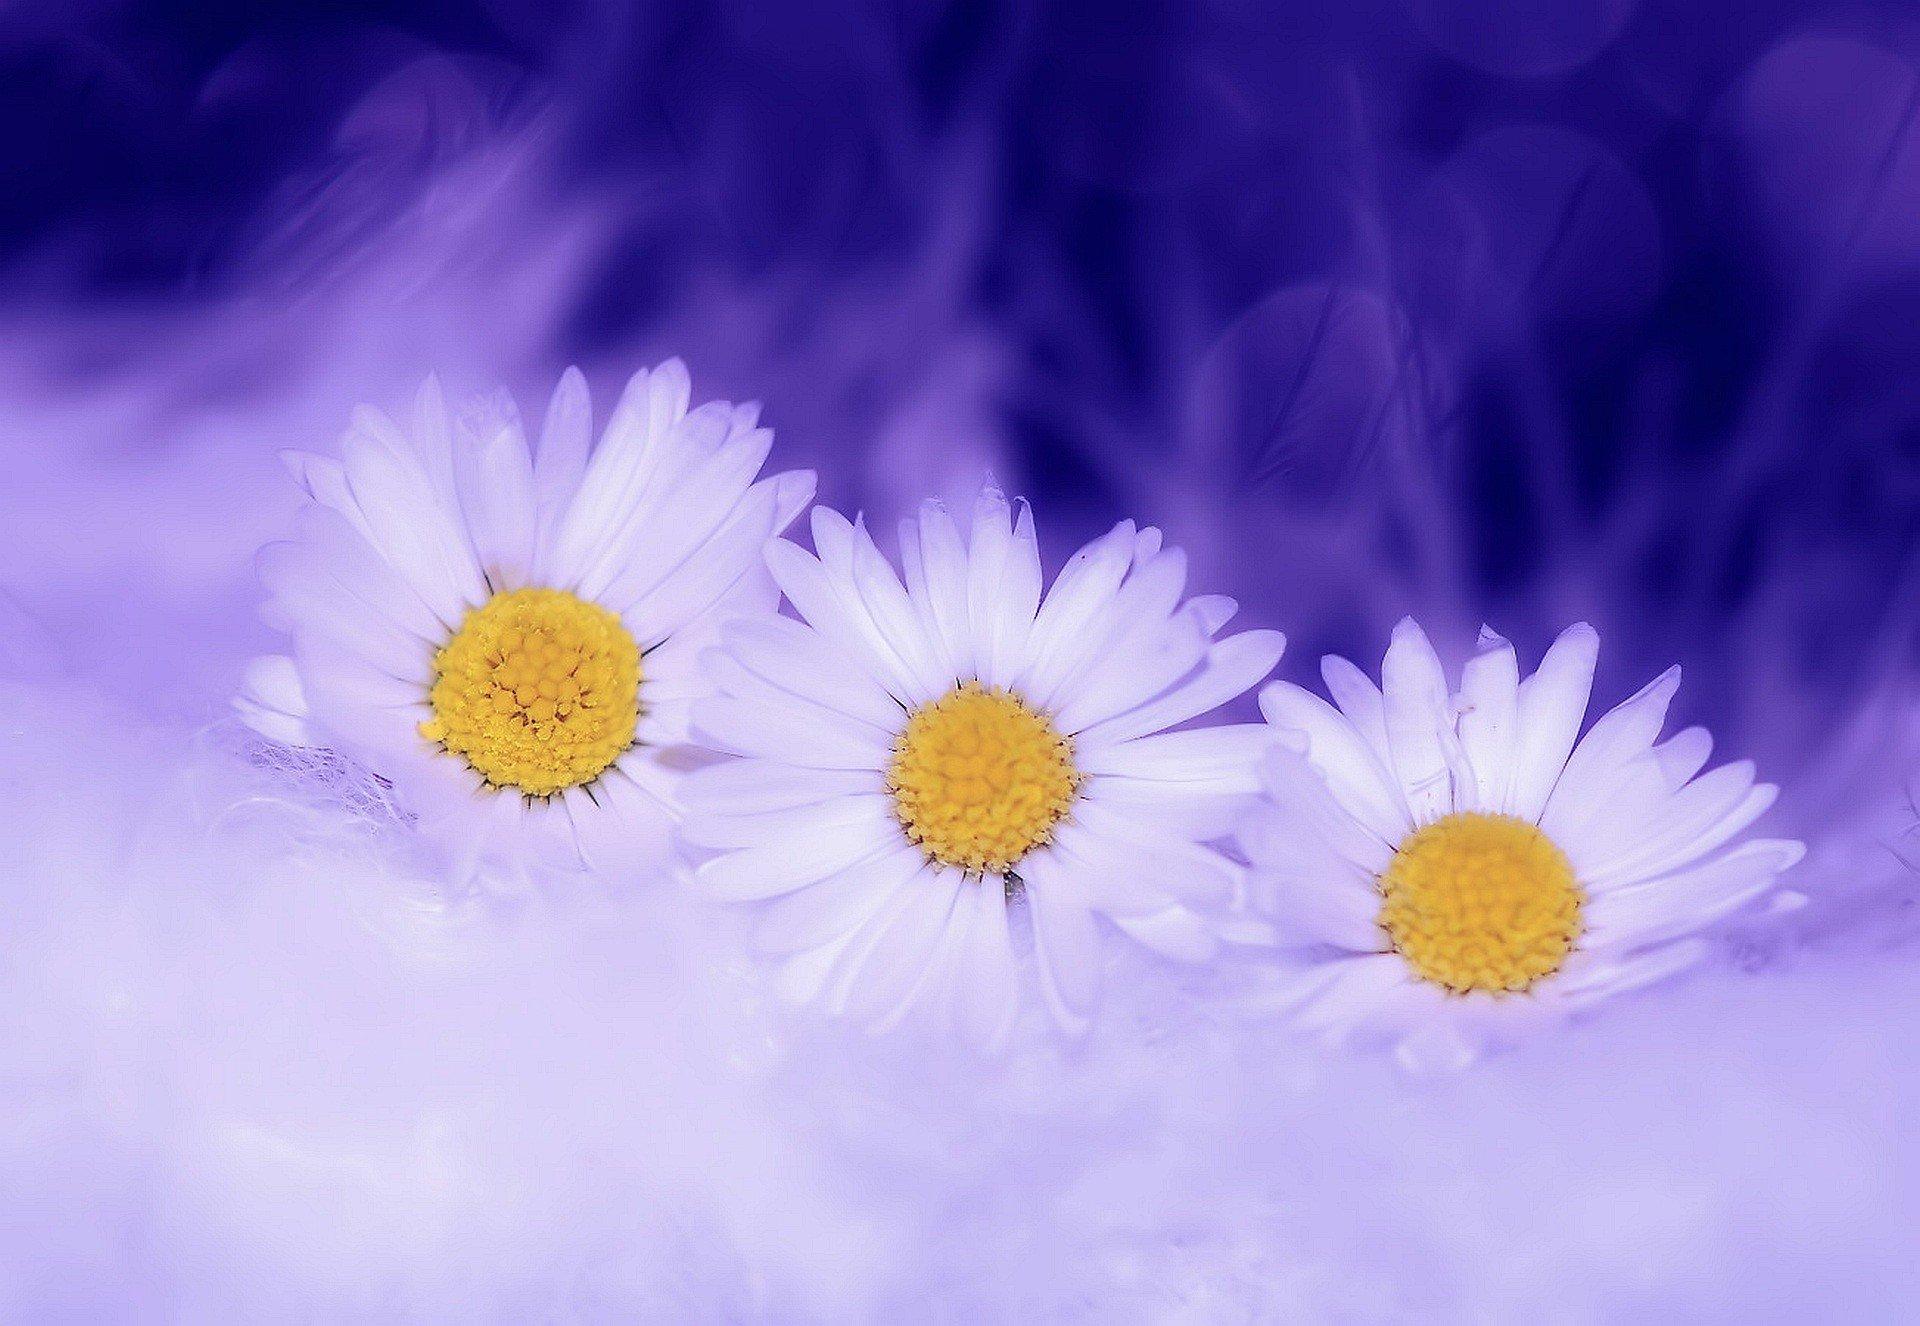 daisy-flowers-white-plant-spring-nature-blossom.jpg